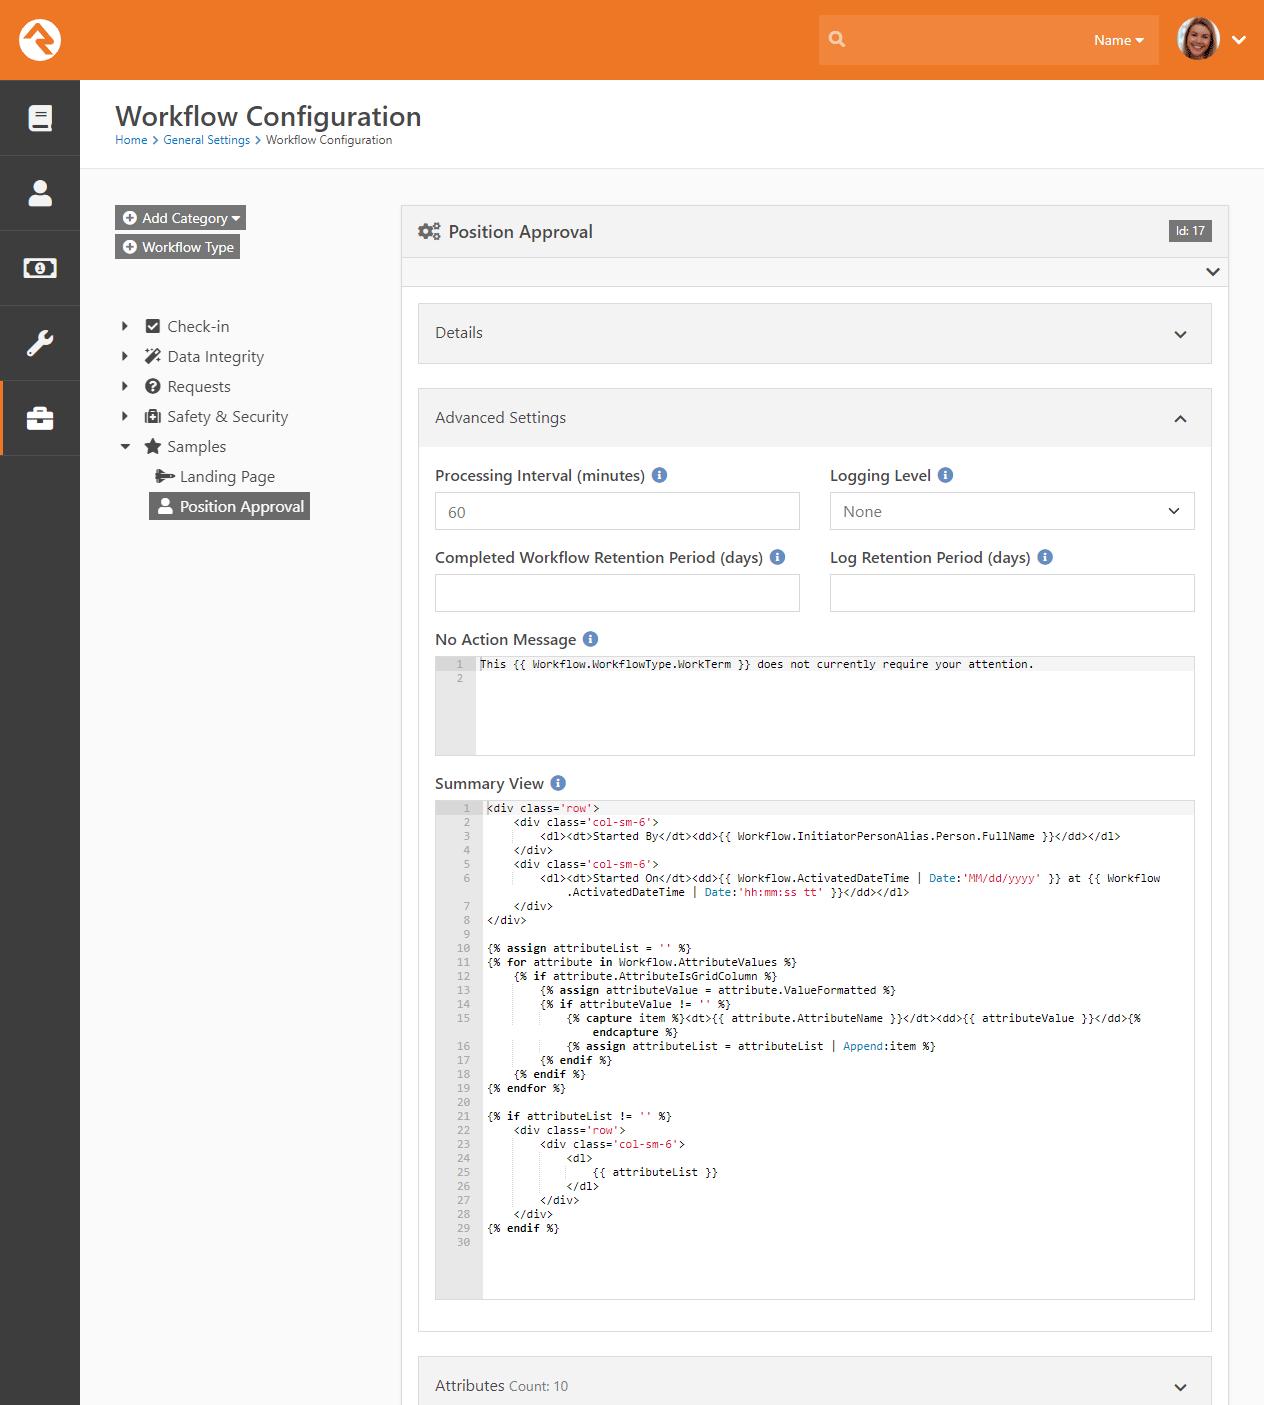 Workflow Advanced Settings